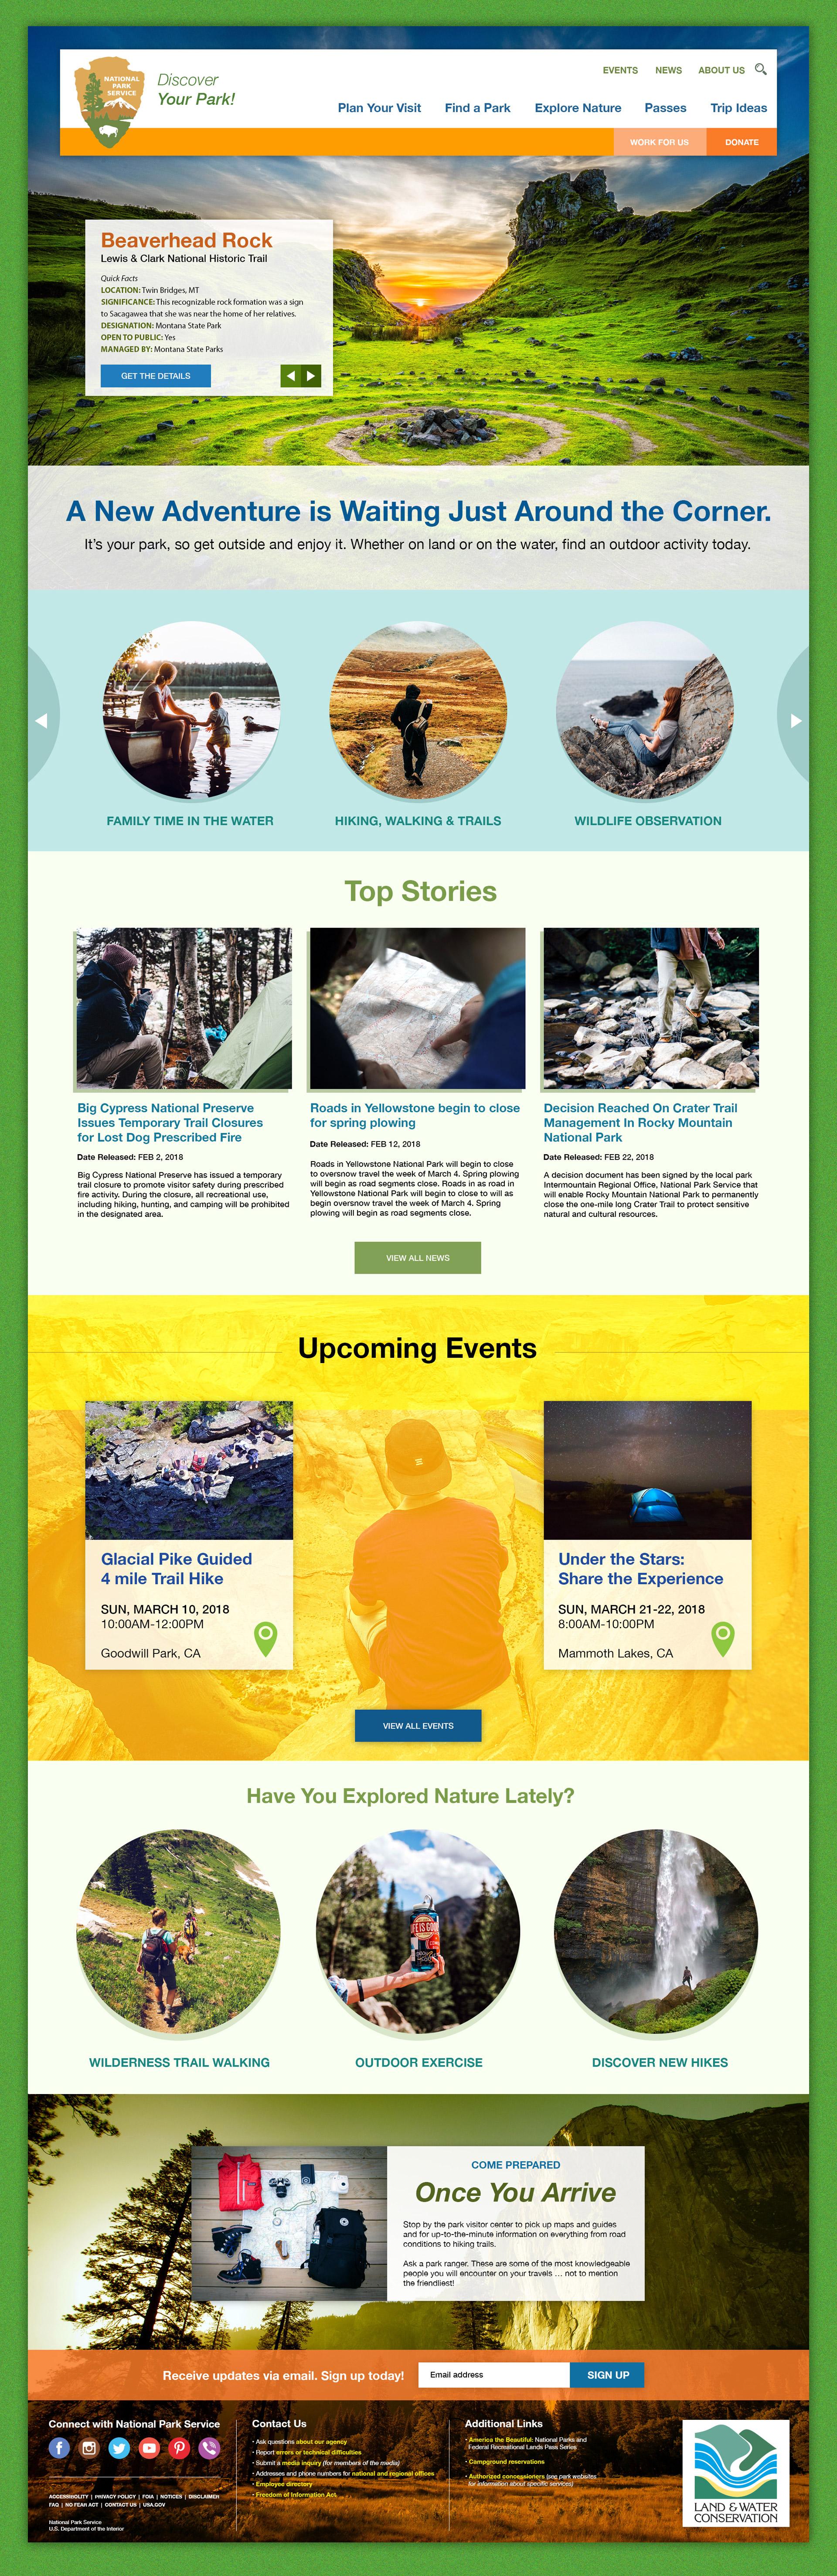 nps_website2.jpg